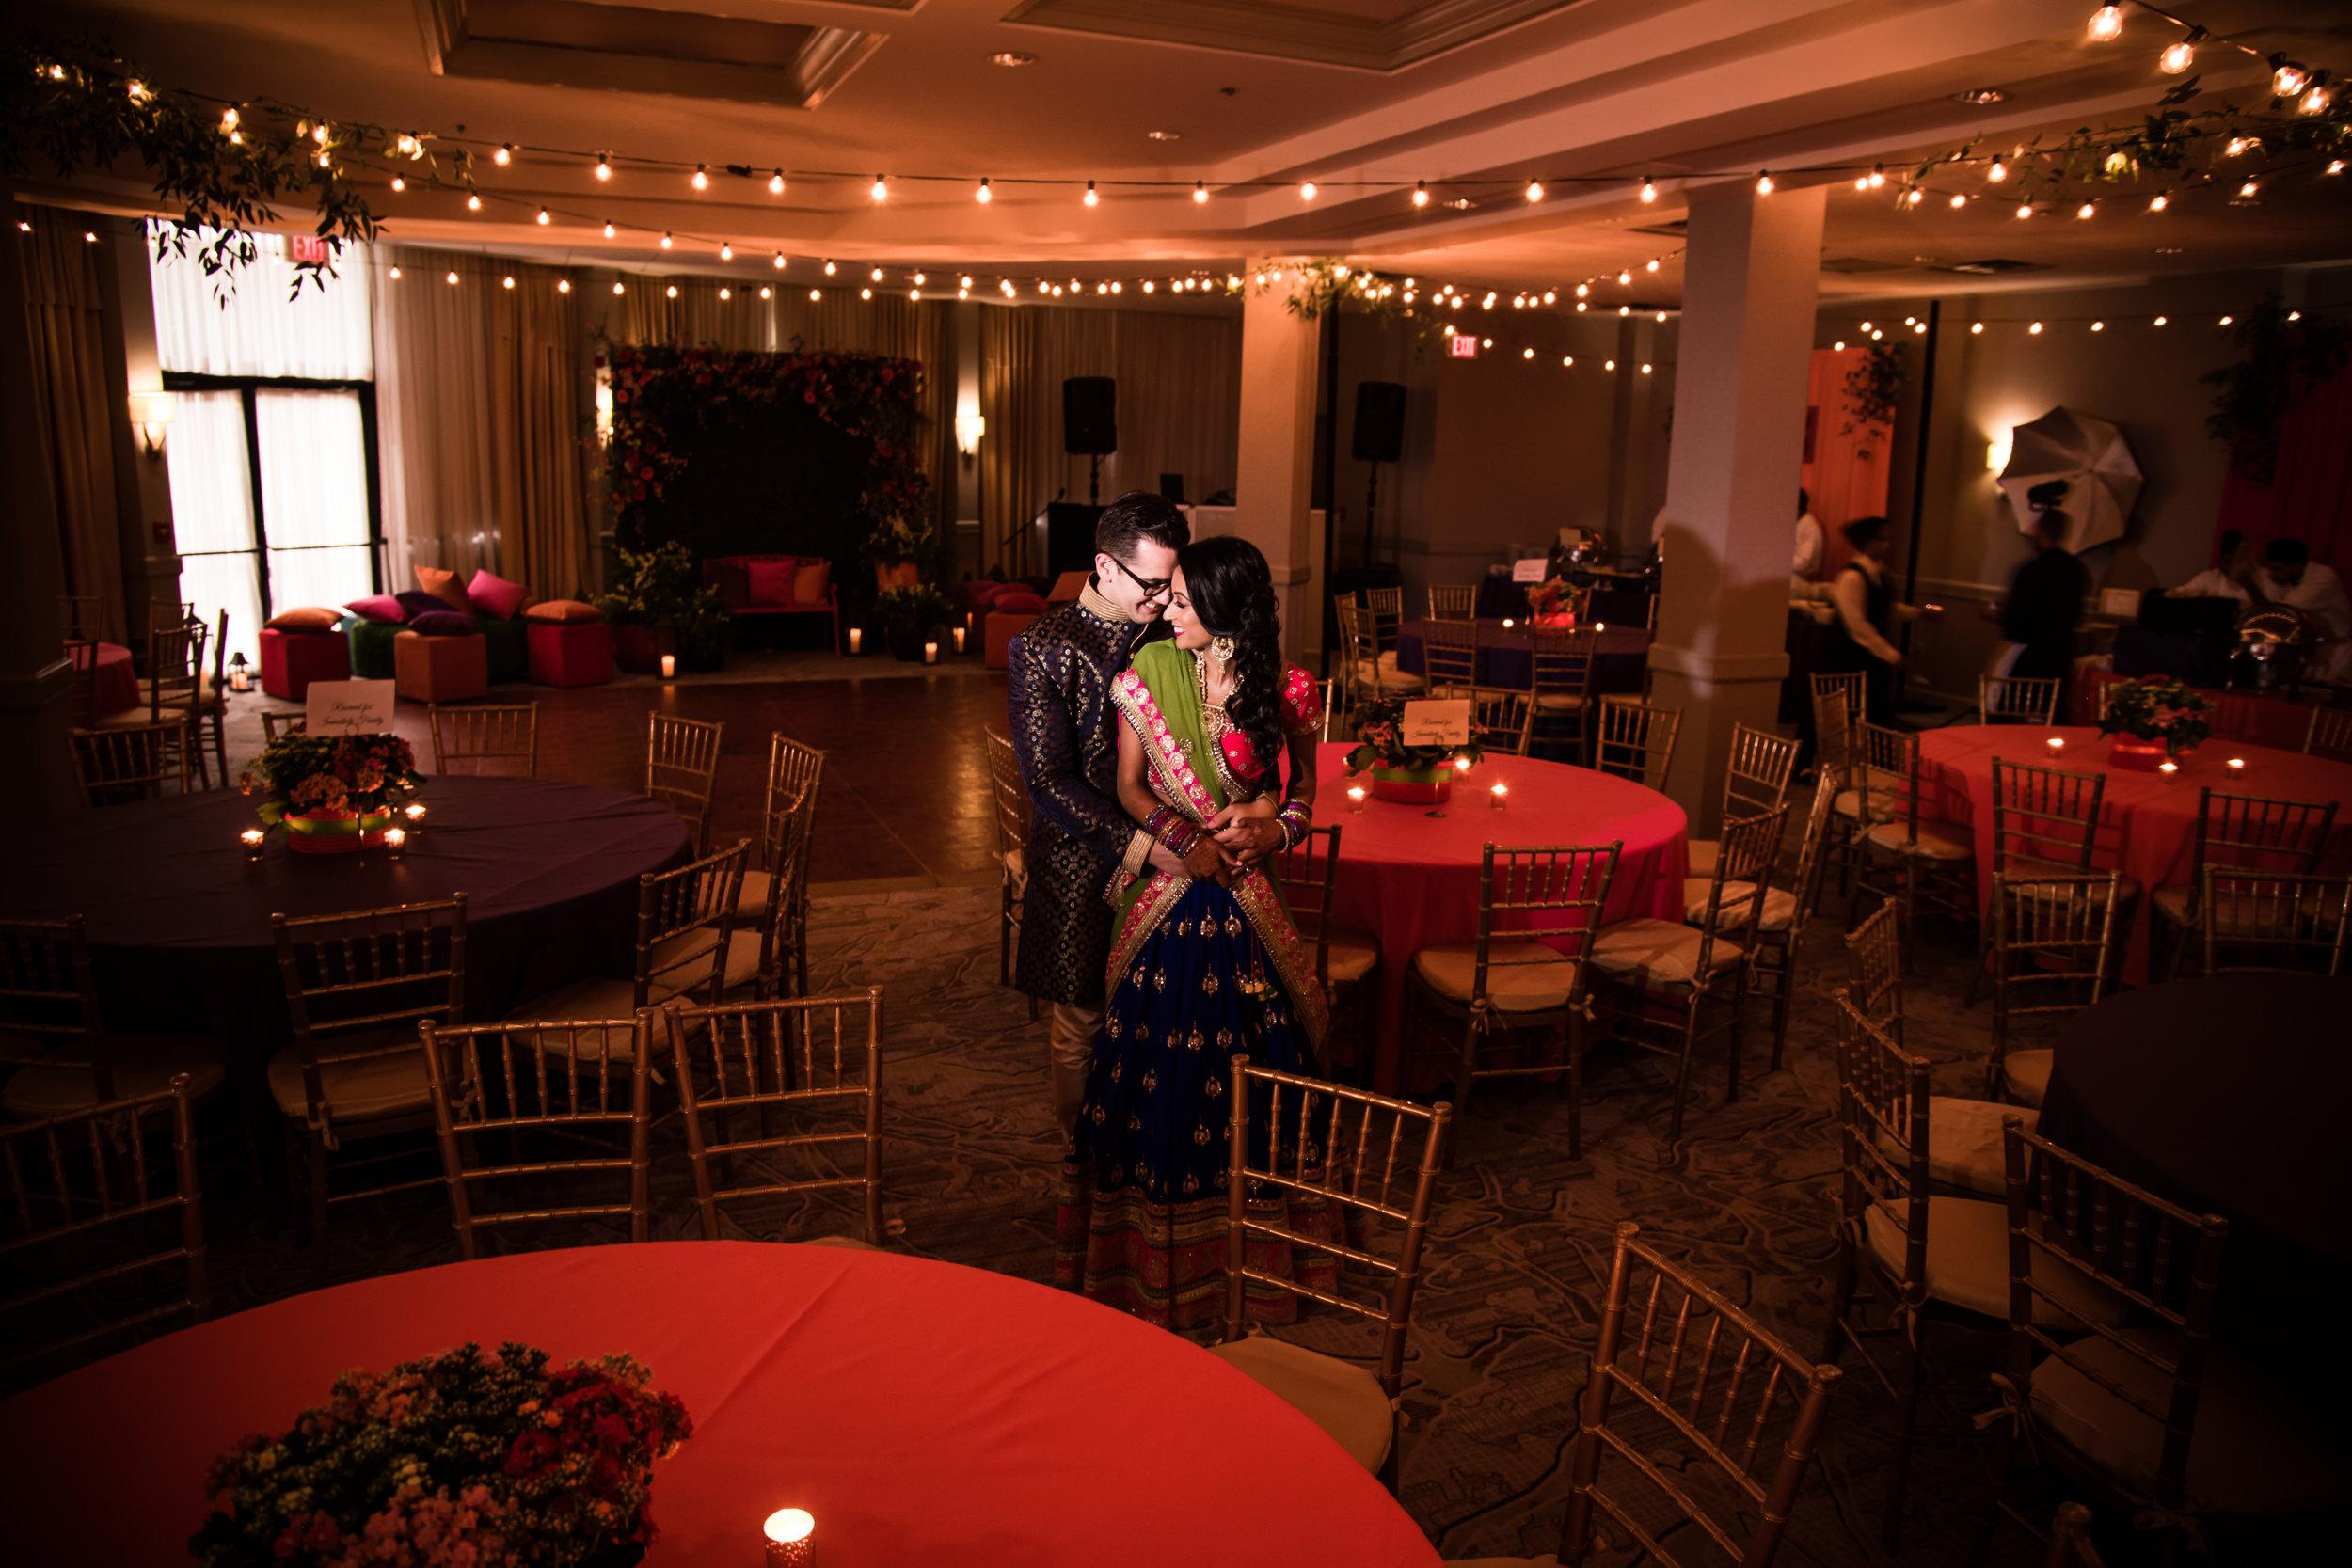 INDIAN WEDDING SANGEET BRIDE AND GROOM WITH VENUE DECOR.jpg